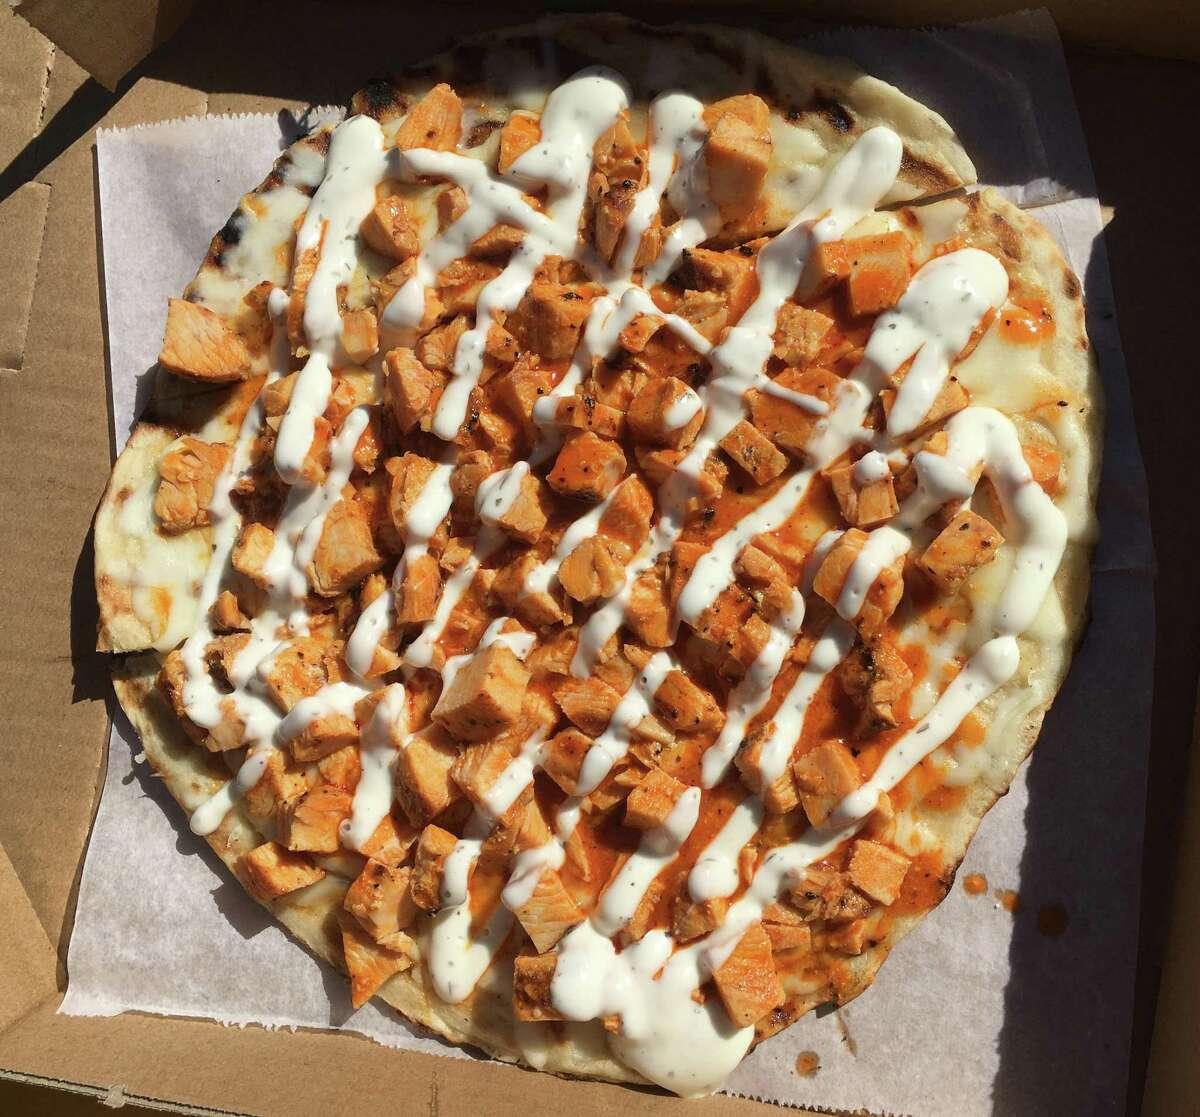 The buffalo chicken pizza at Bob & Timmy's on Wheels